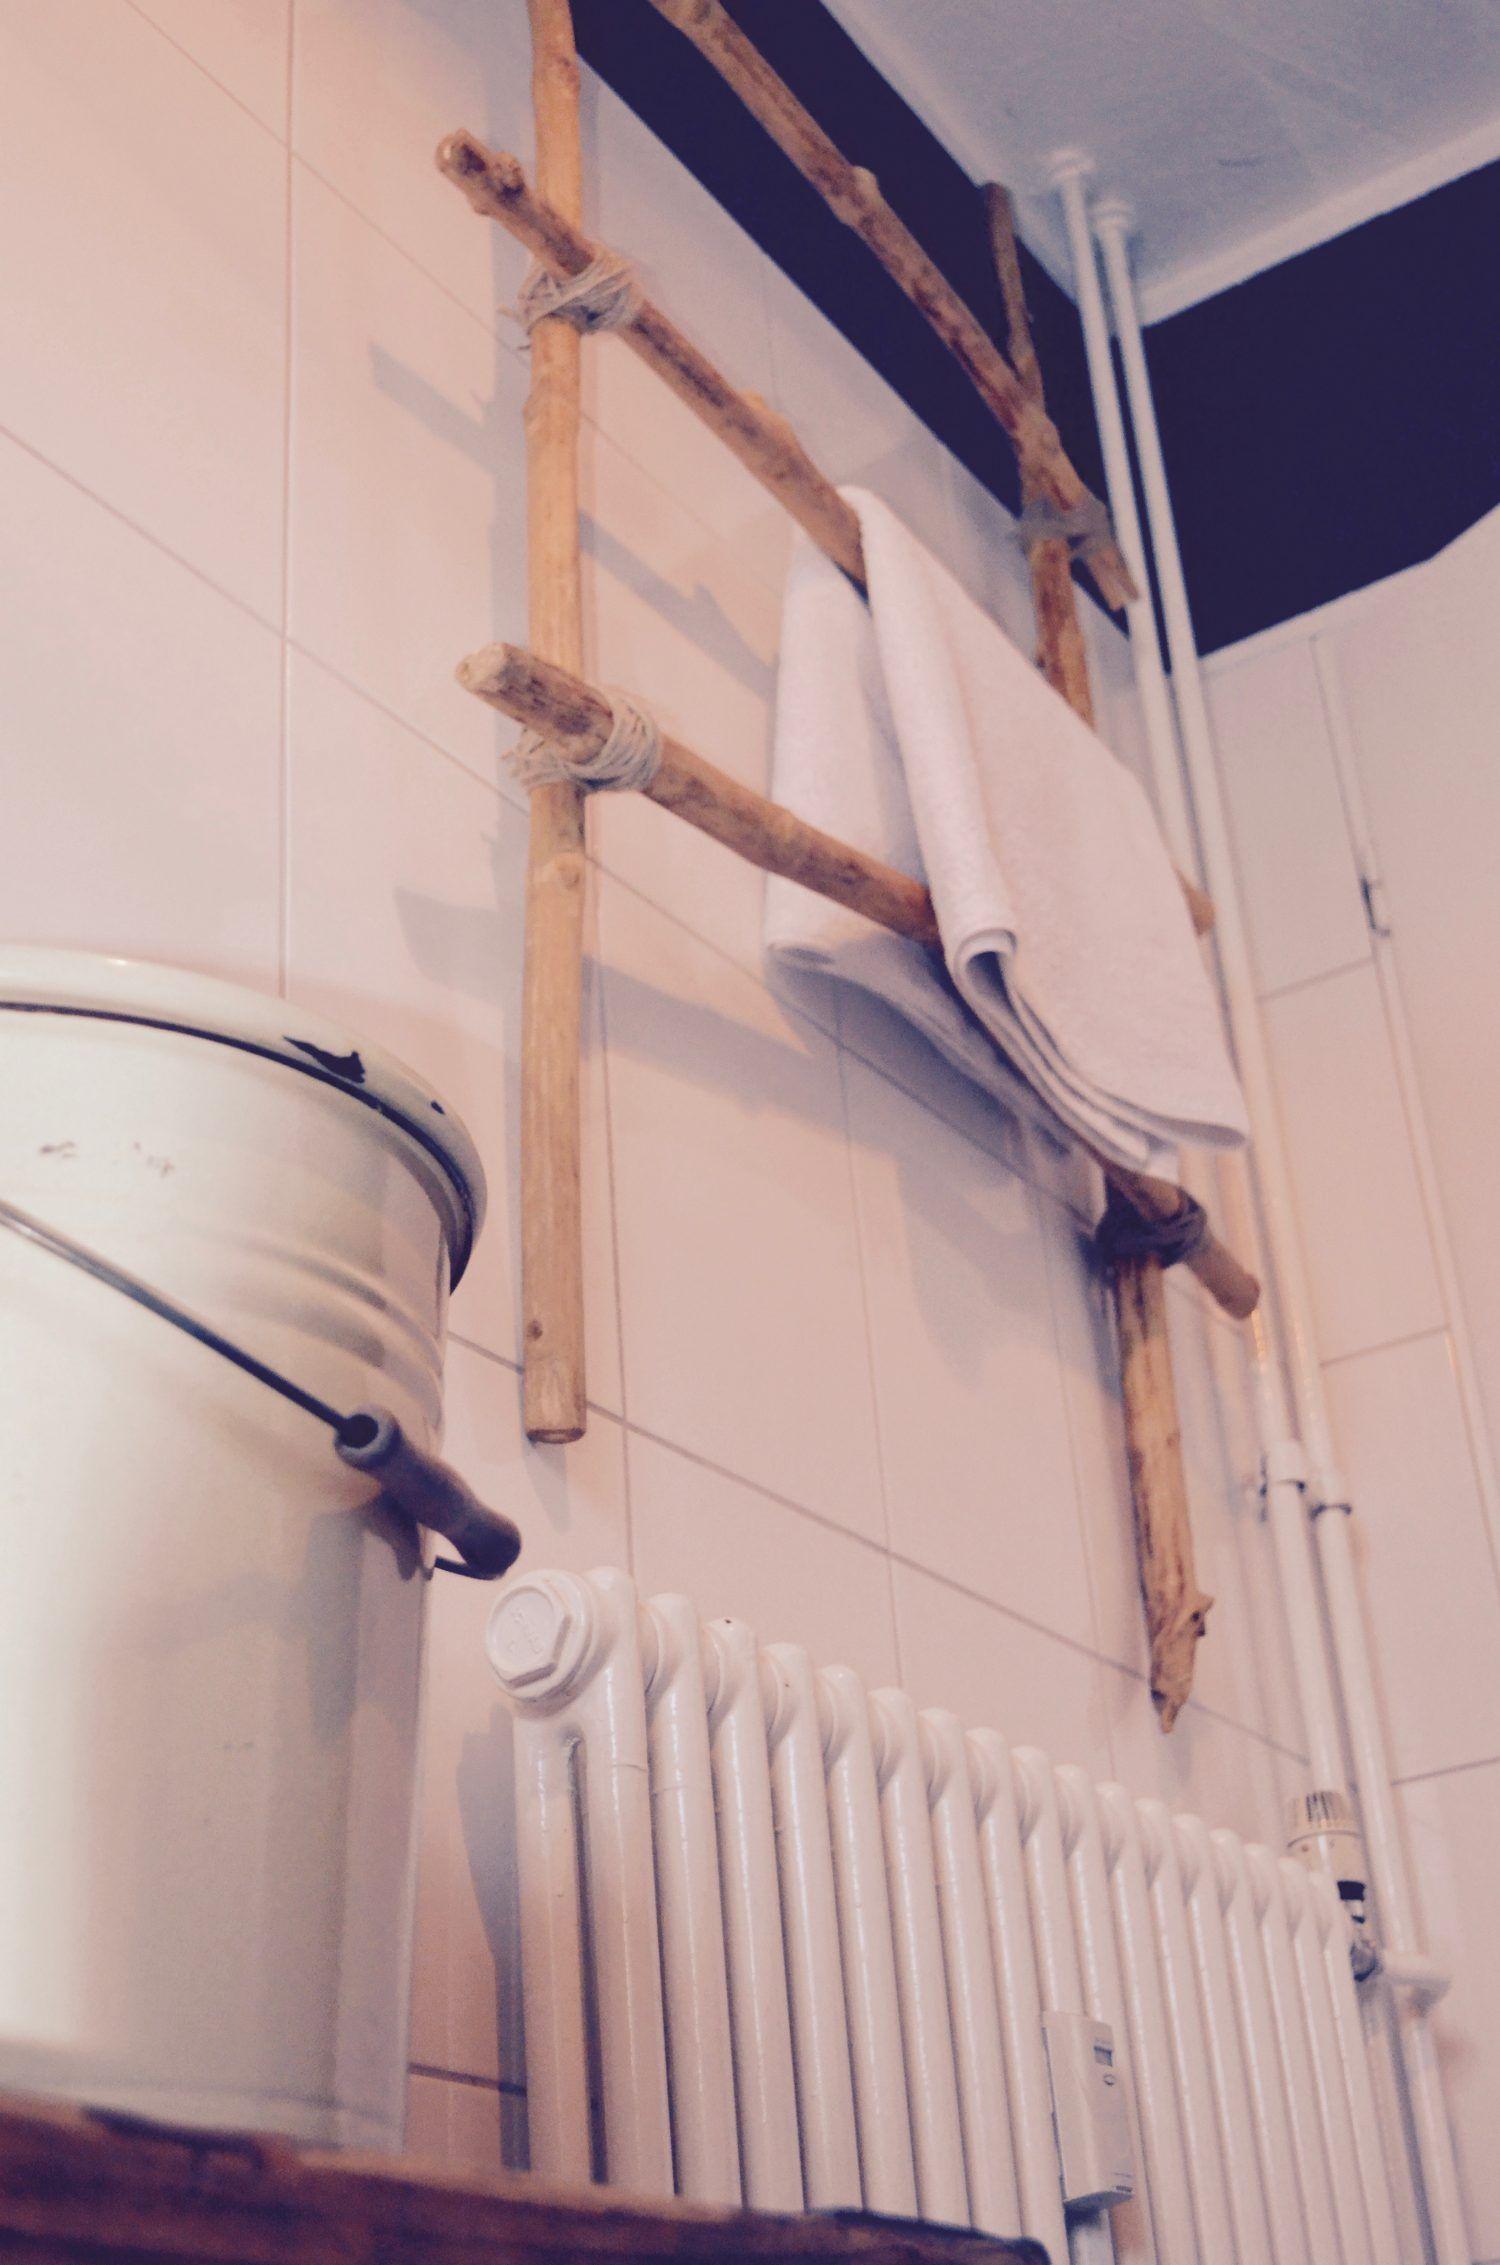 Full Size of Handtuchhalter Heizung Holz Heizkörper Bad Badezimmer Elektroheizkörper Für Küche Wohnzimmer Wohnzimmer Handtuchhalter Heizkörper